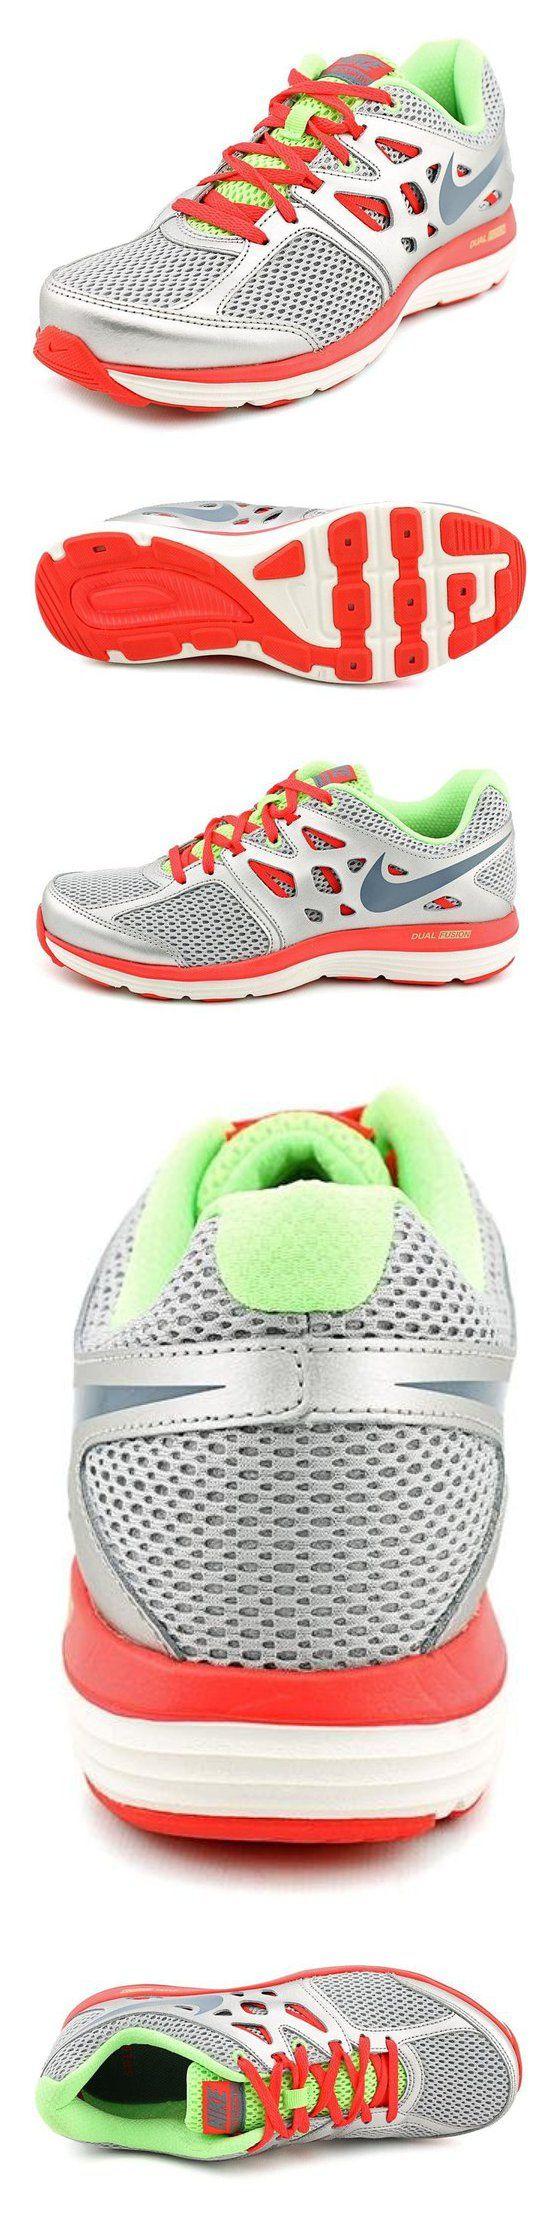 $74.99 - Nike Women's Dual Fusion Lite Grey/Pink/White Running Shoe - 6 B(M) US #shoes #nike #2014